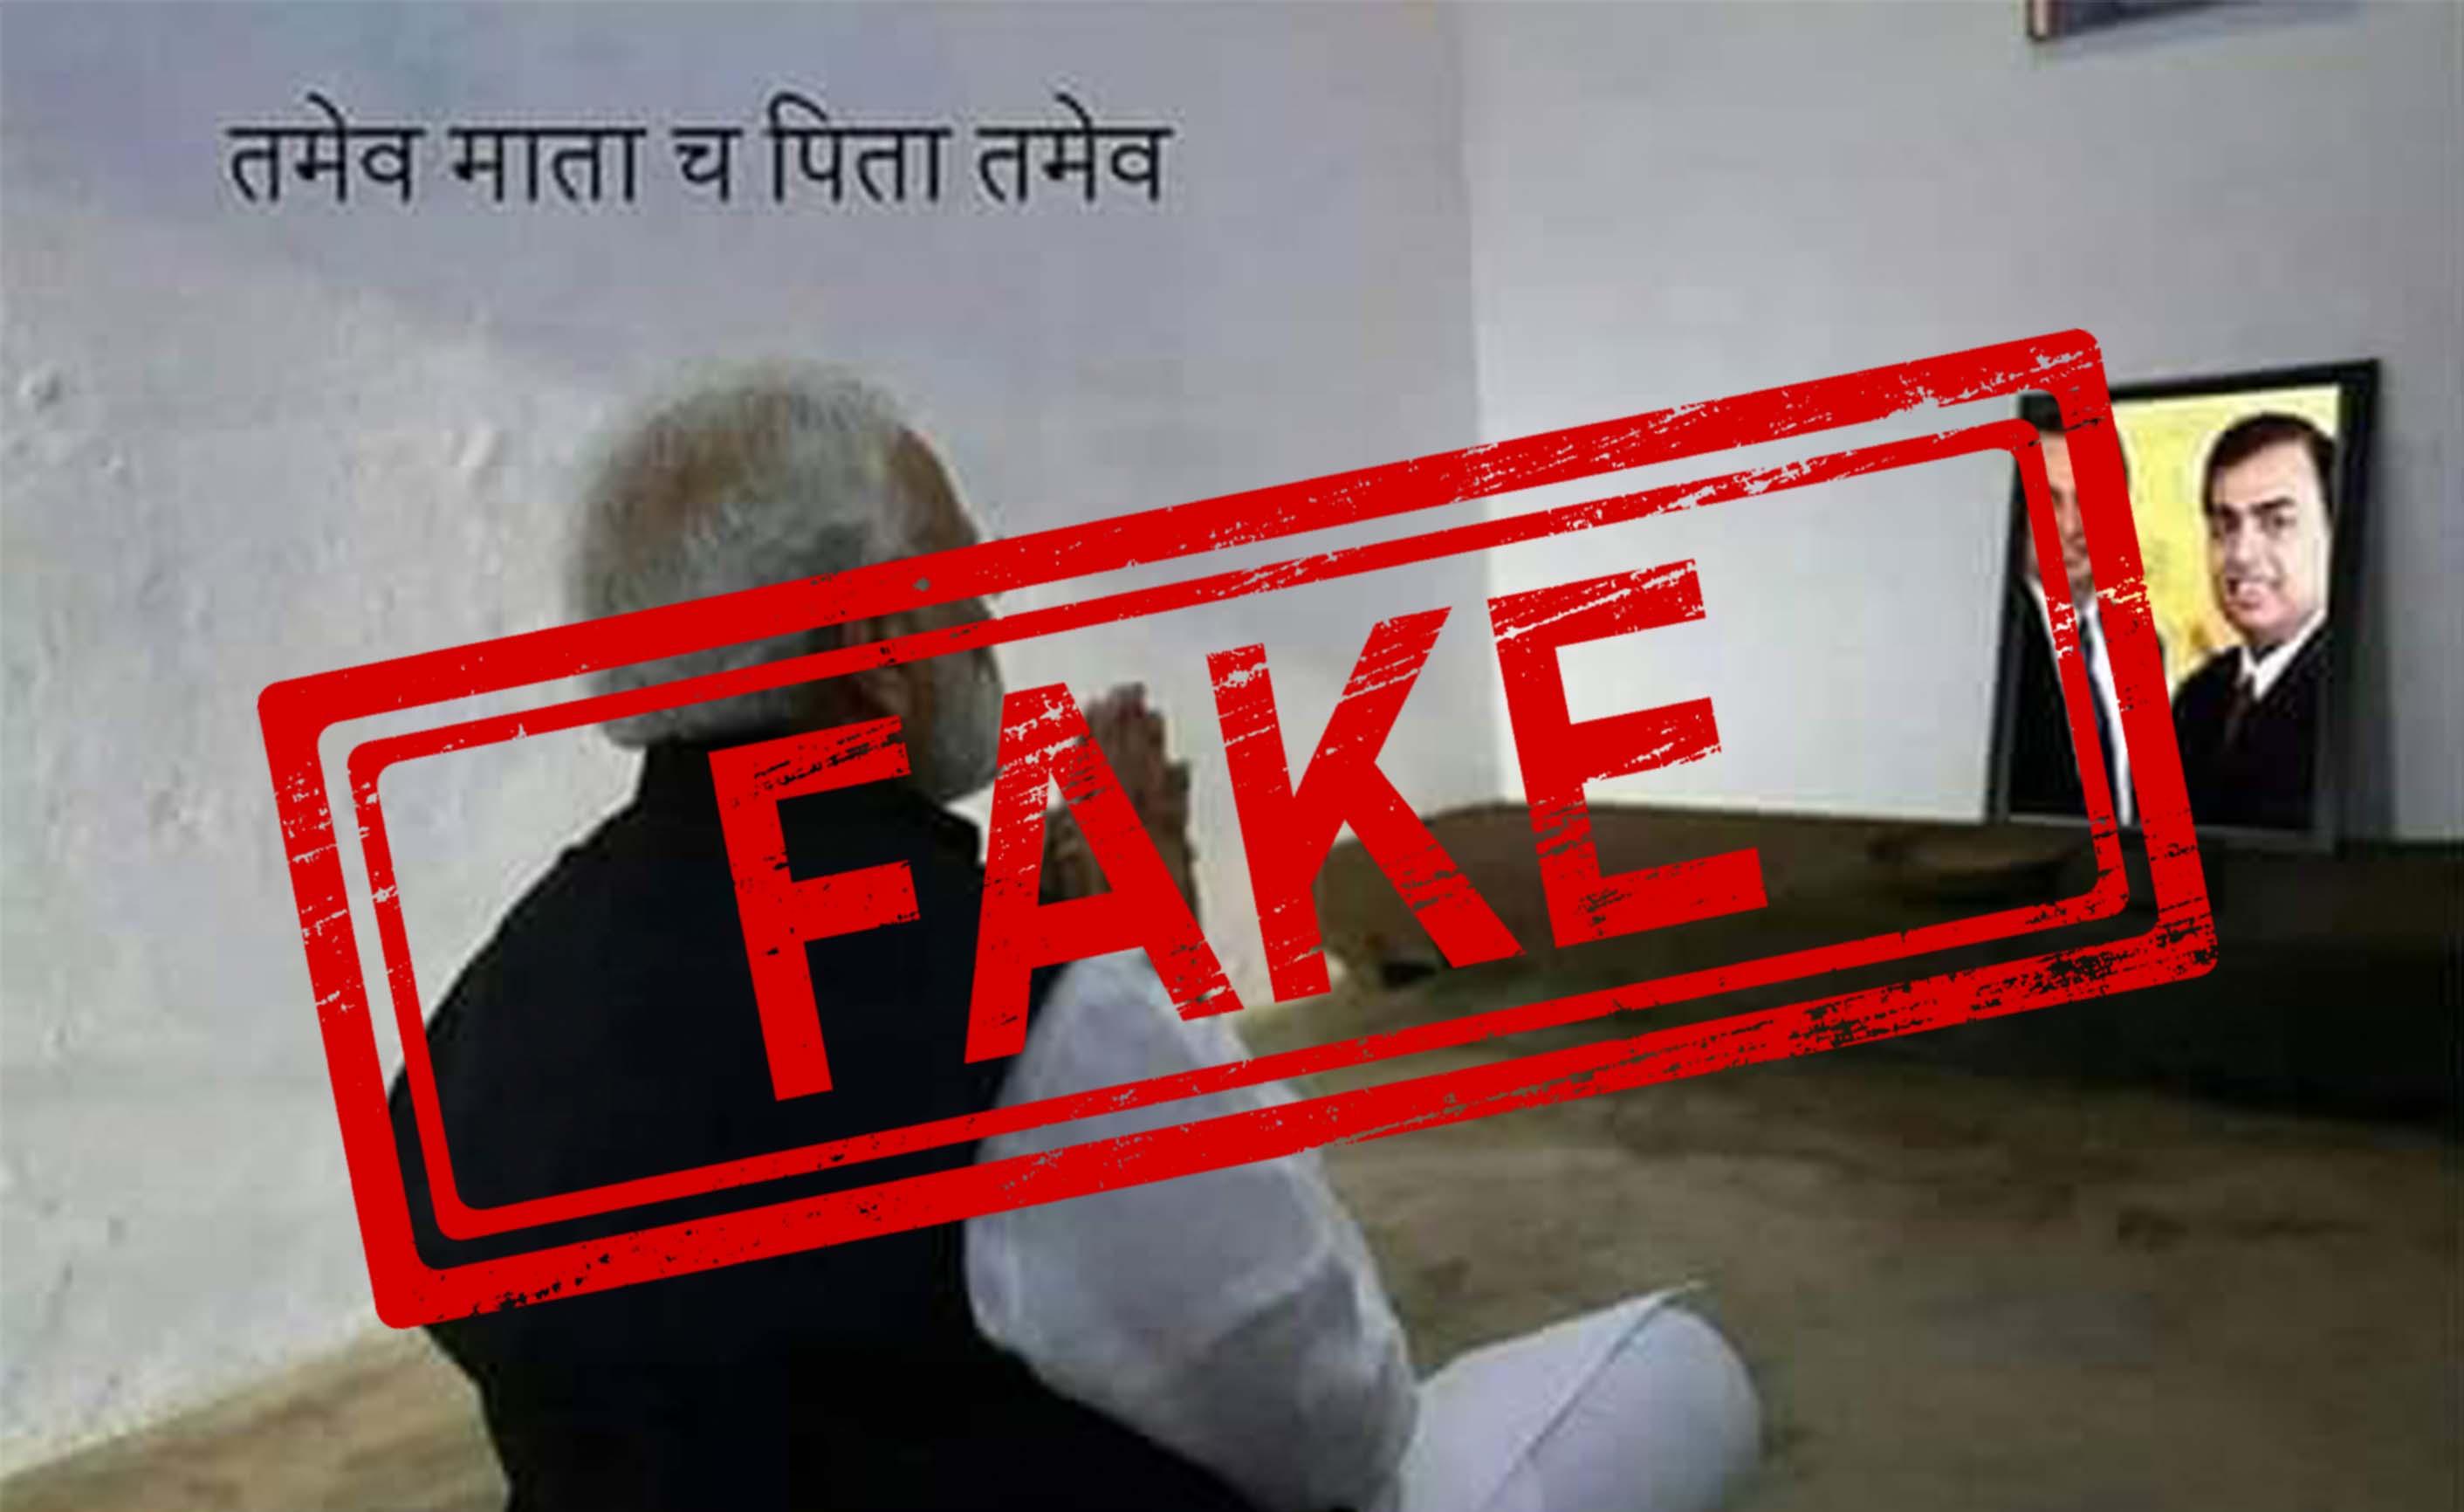 Prime Minister, Narendra Modi, Anil Ambani, Mukesh Ambani, NewsMobile, Mobile, news, India, Fact Check, Fact Checker, Fake, News